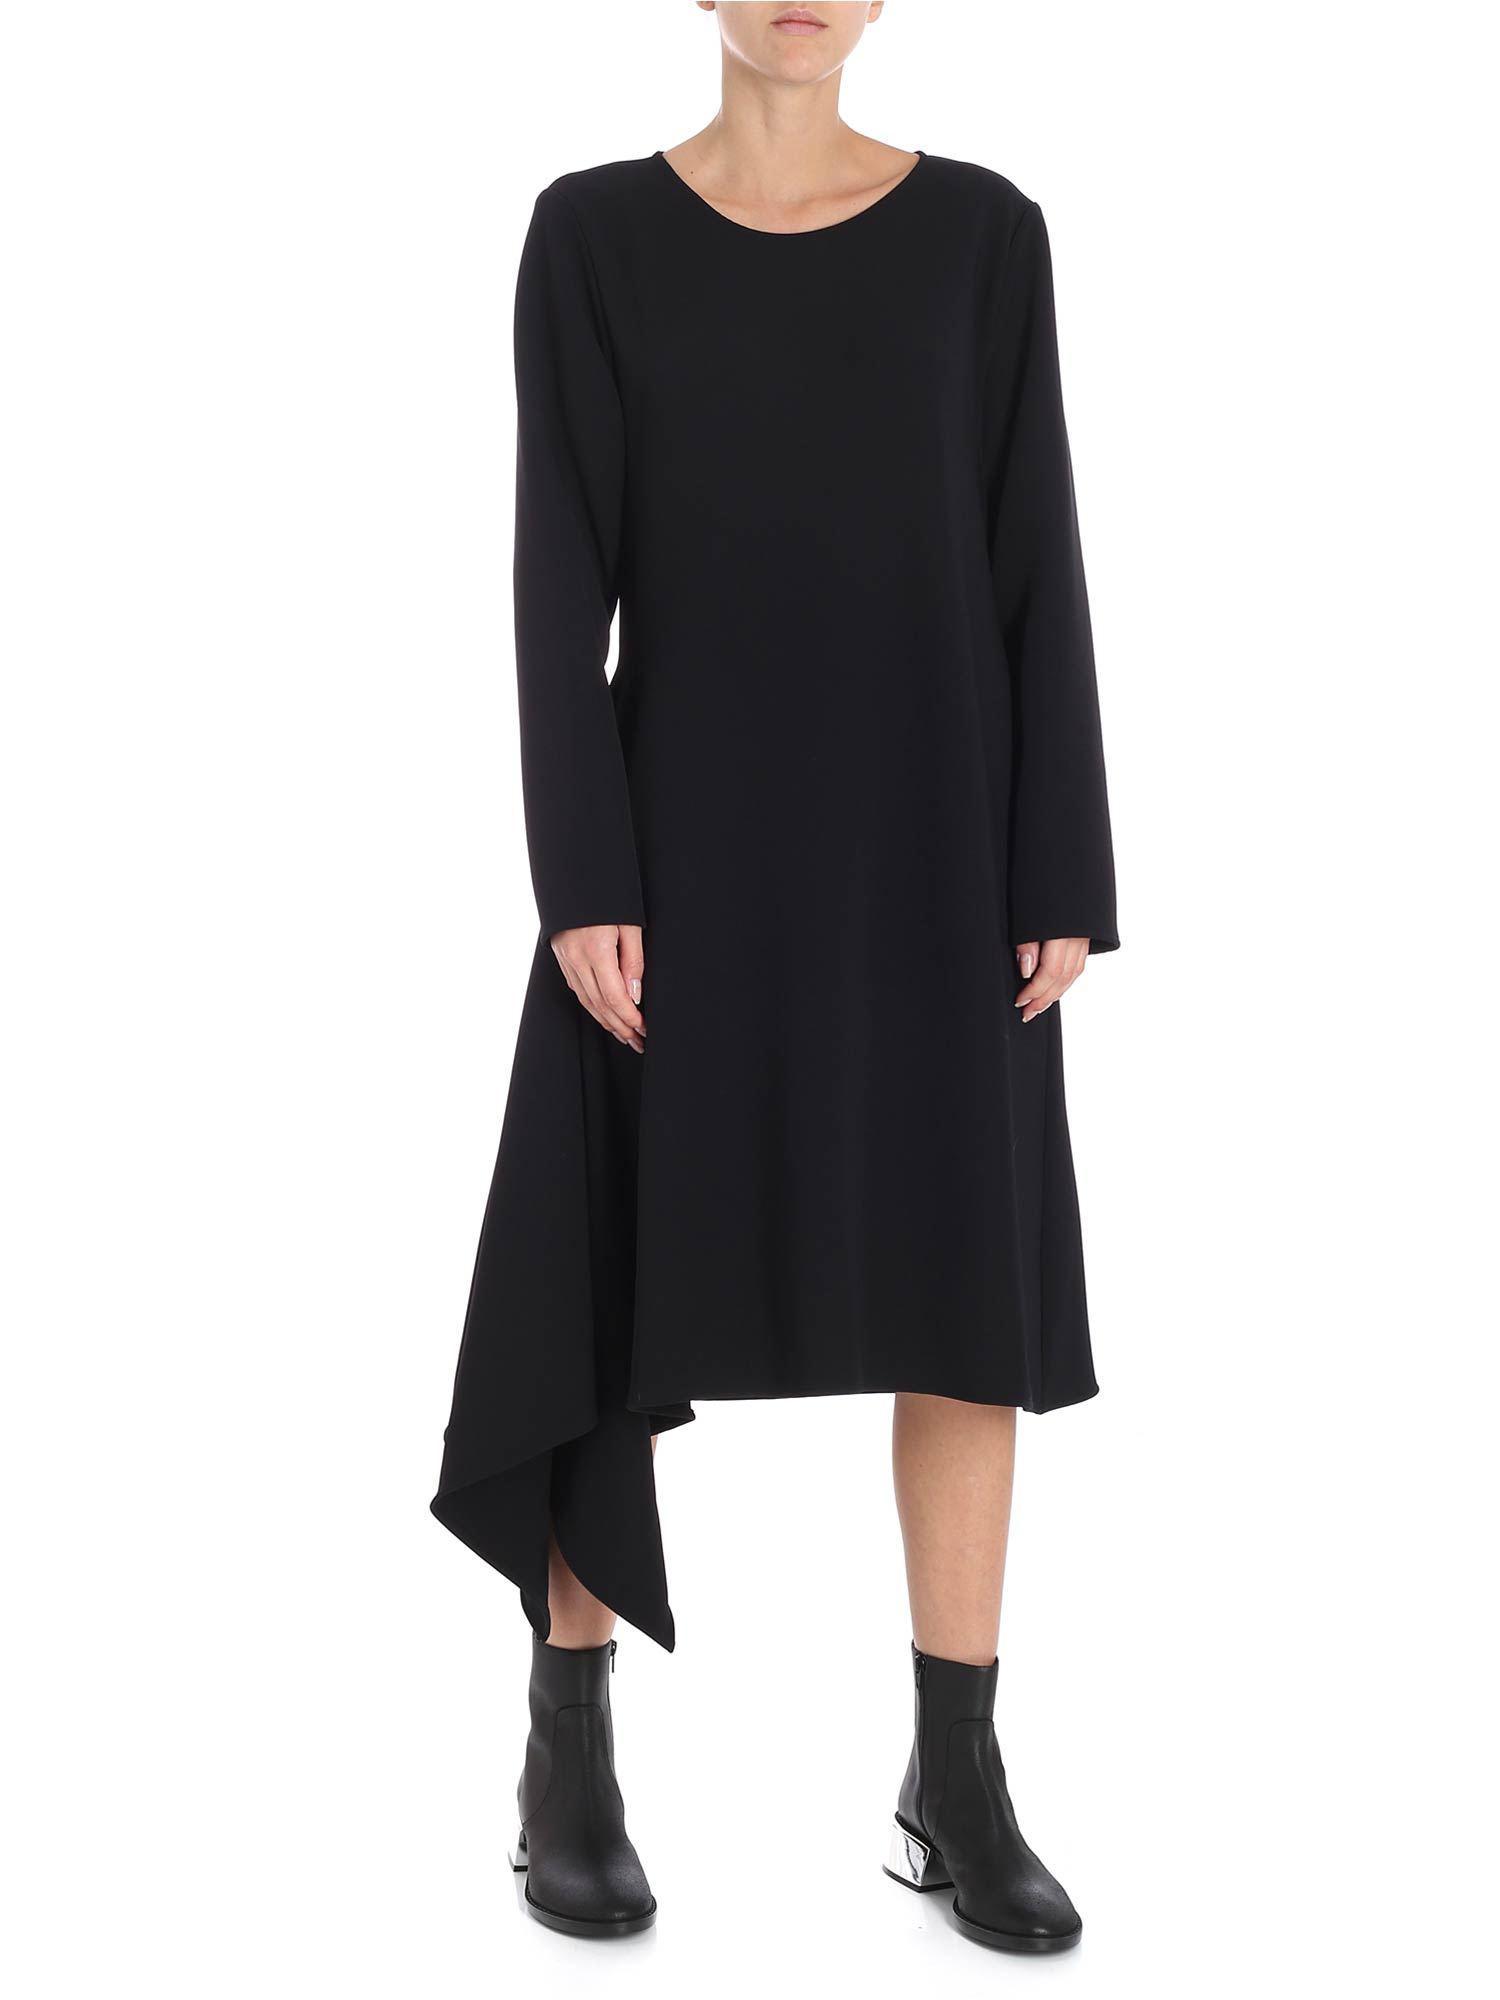 7717e5fb268 MM6 by Maison Martin Margiela Black Asymmetric Long Sleeve Dress in Black -  Lyst